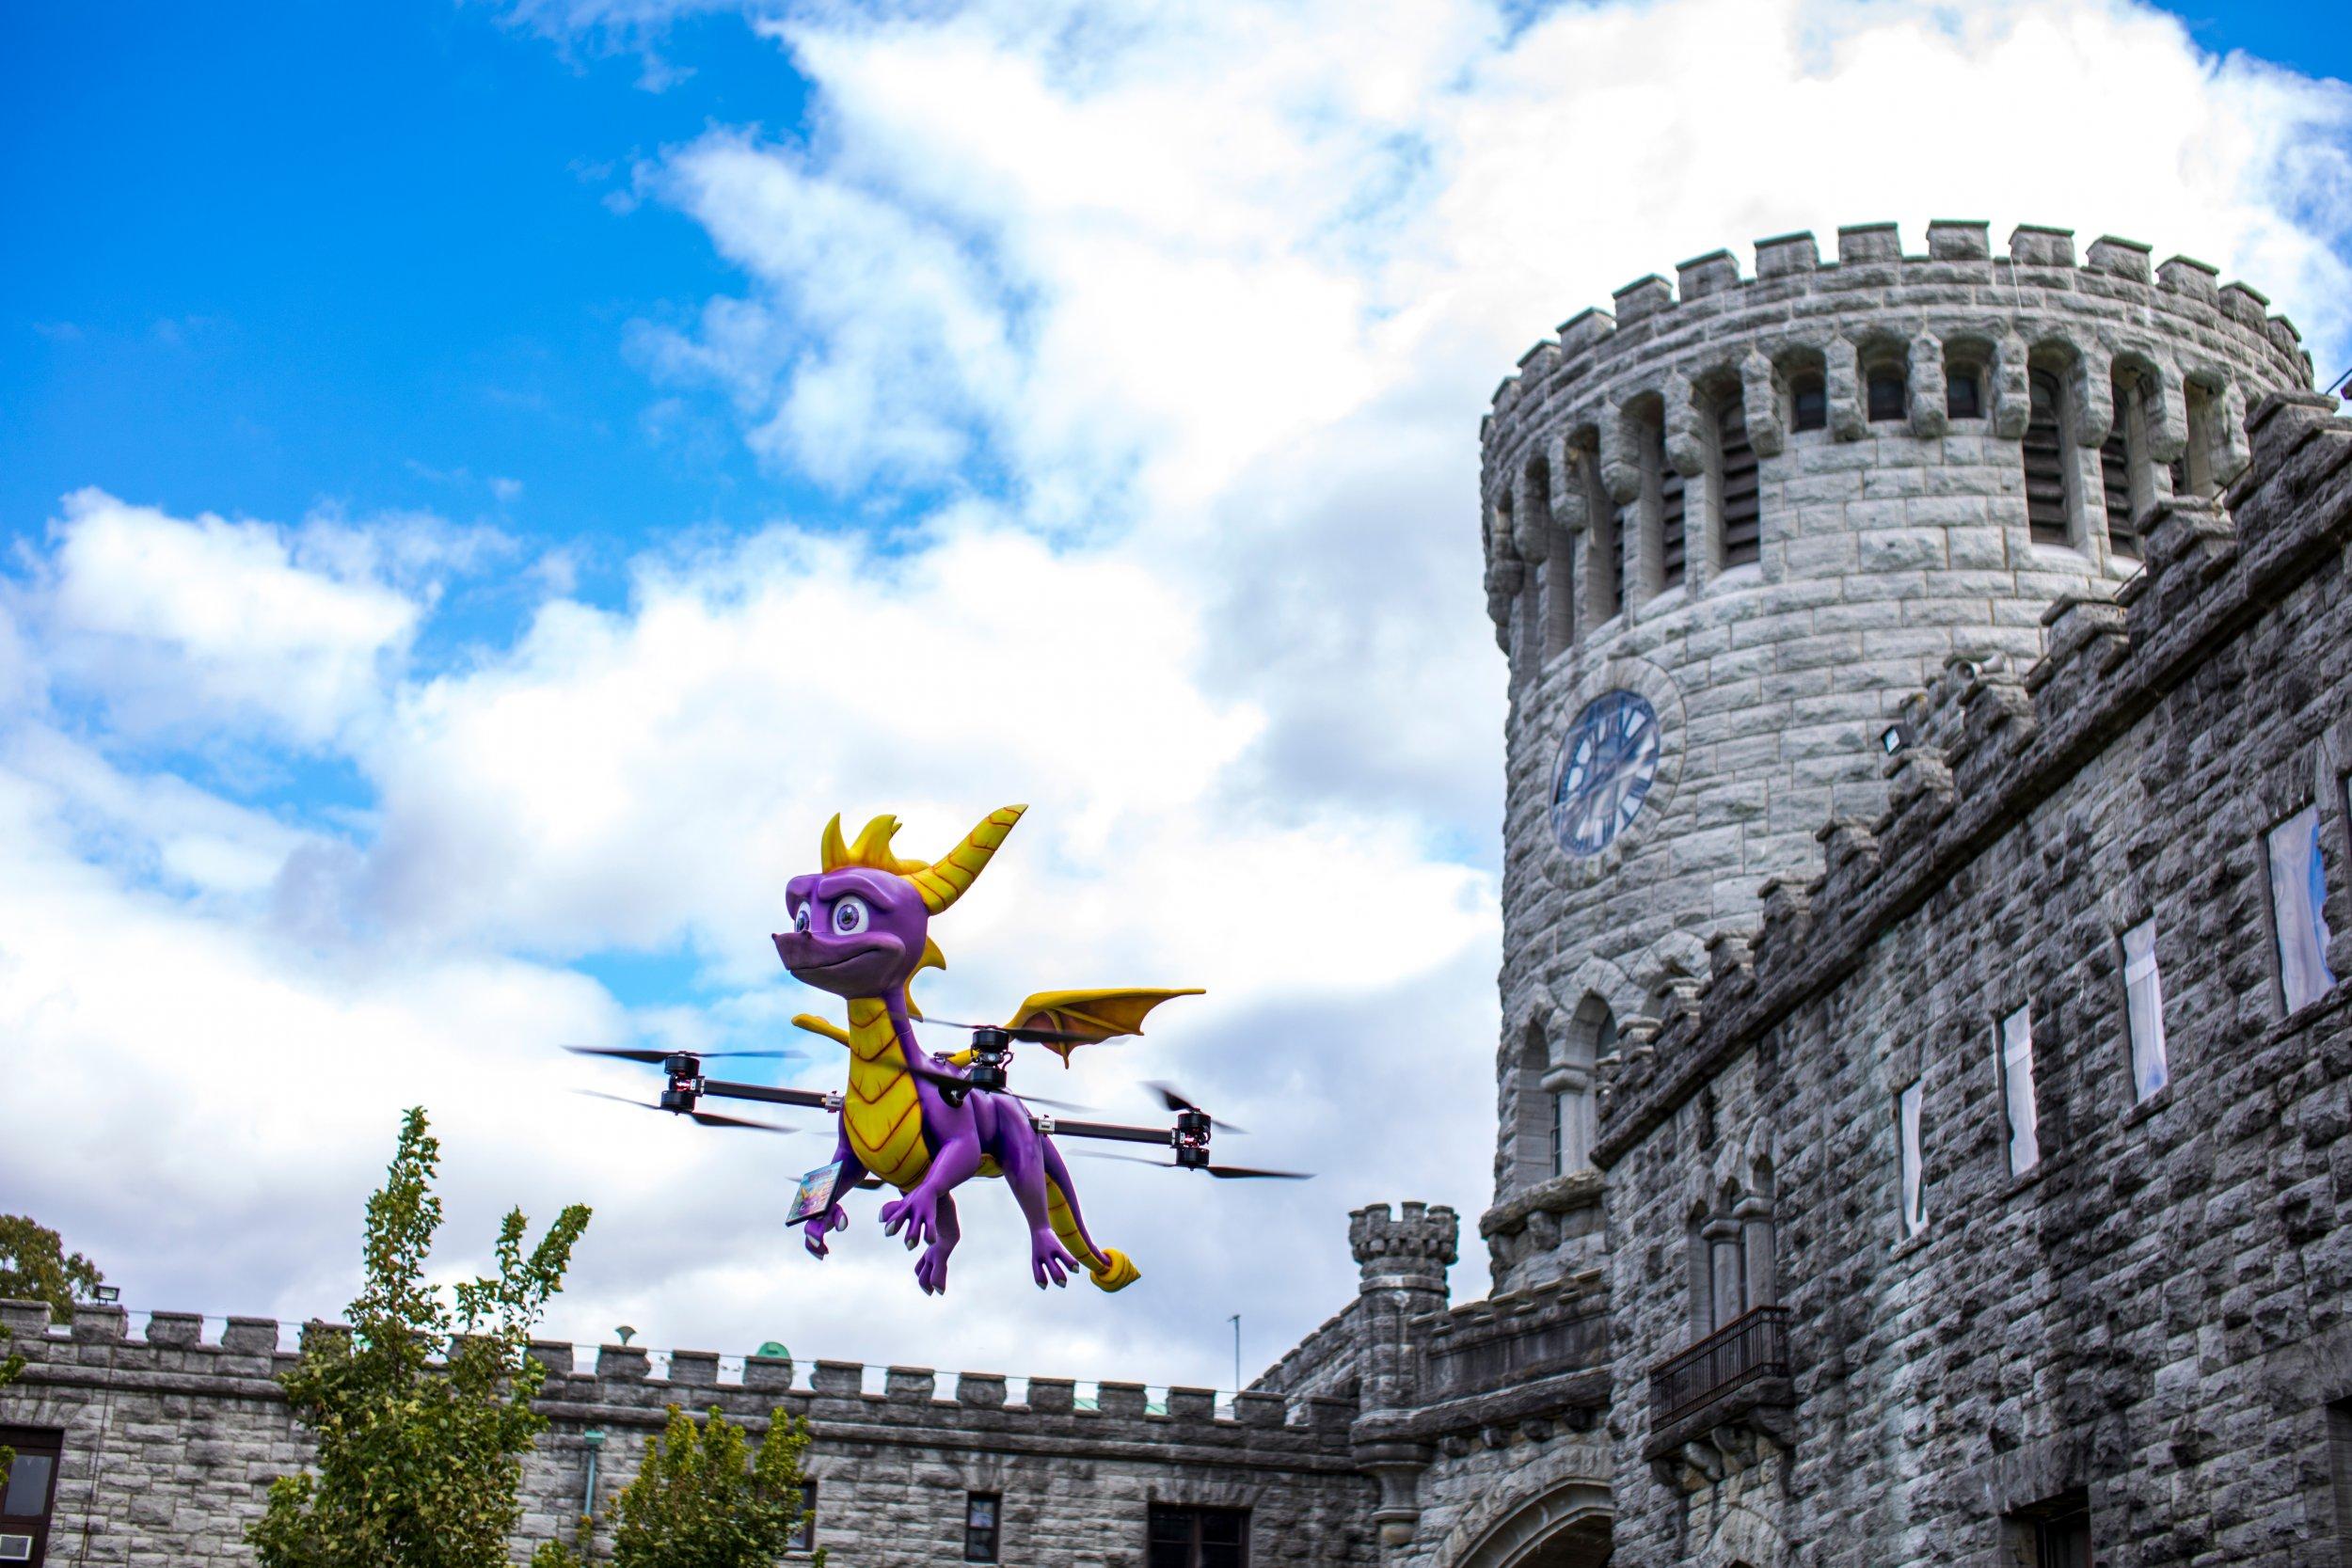 spyro-drone-snoop-dogg-flying